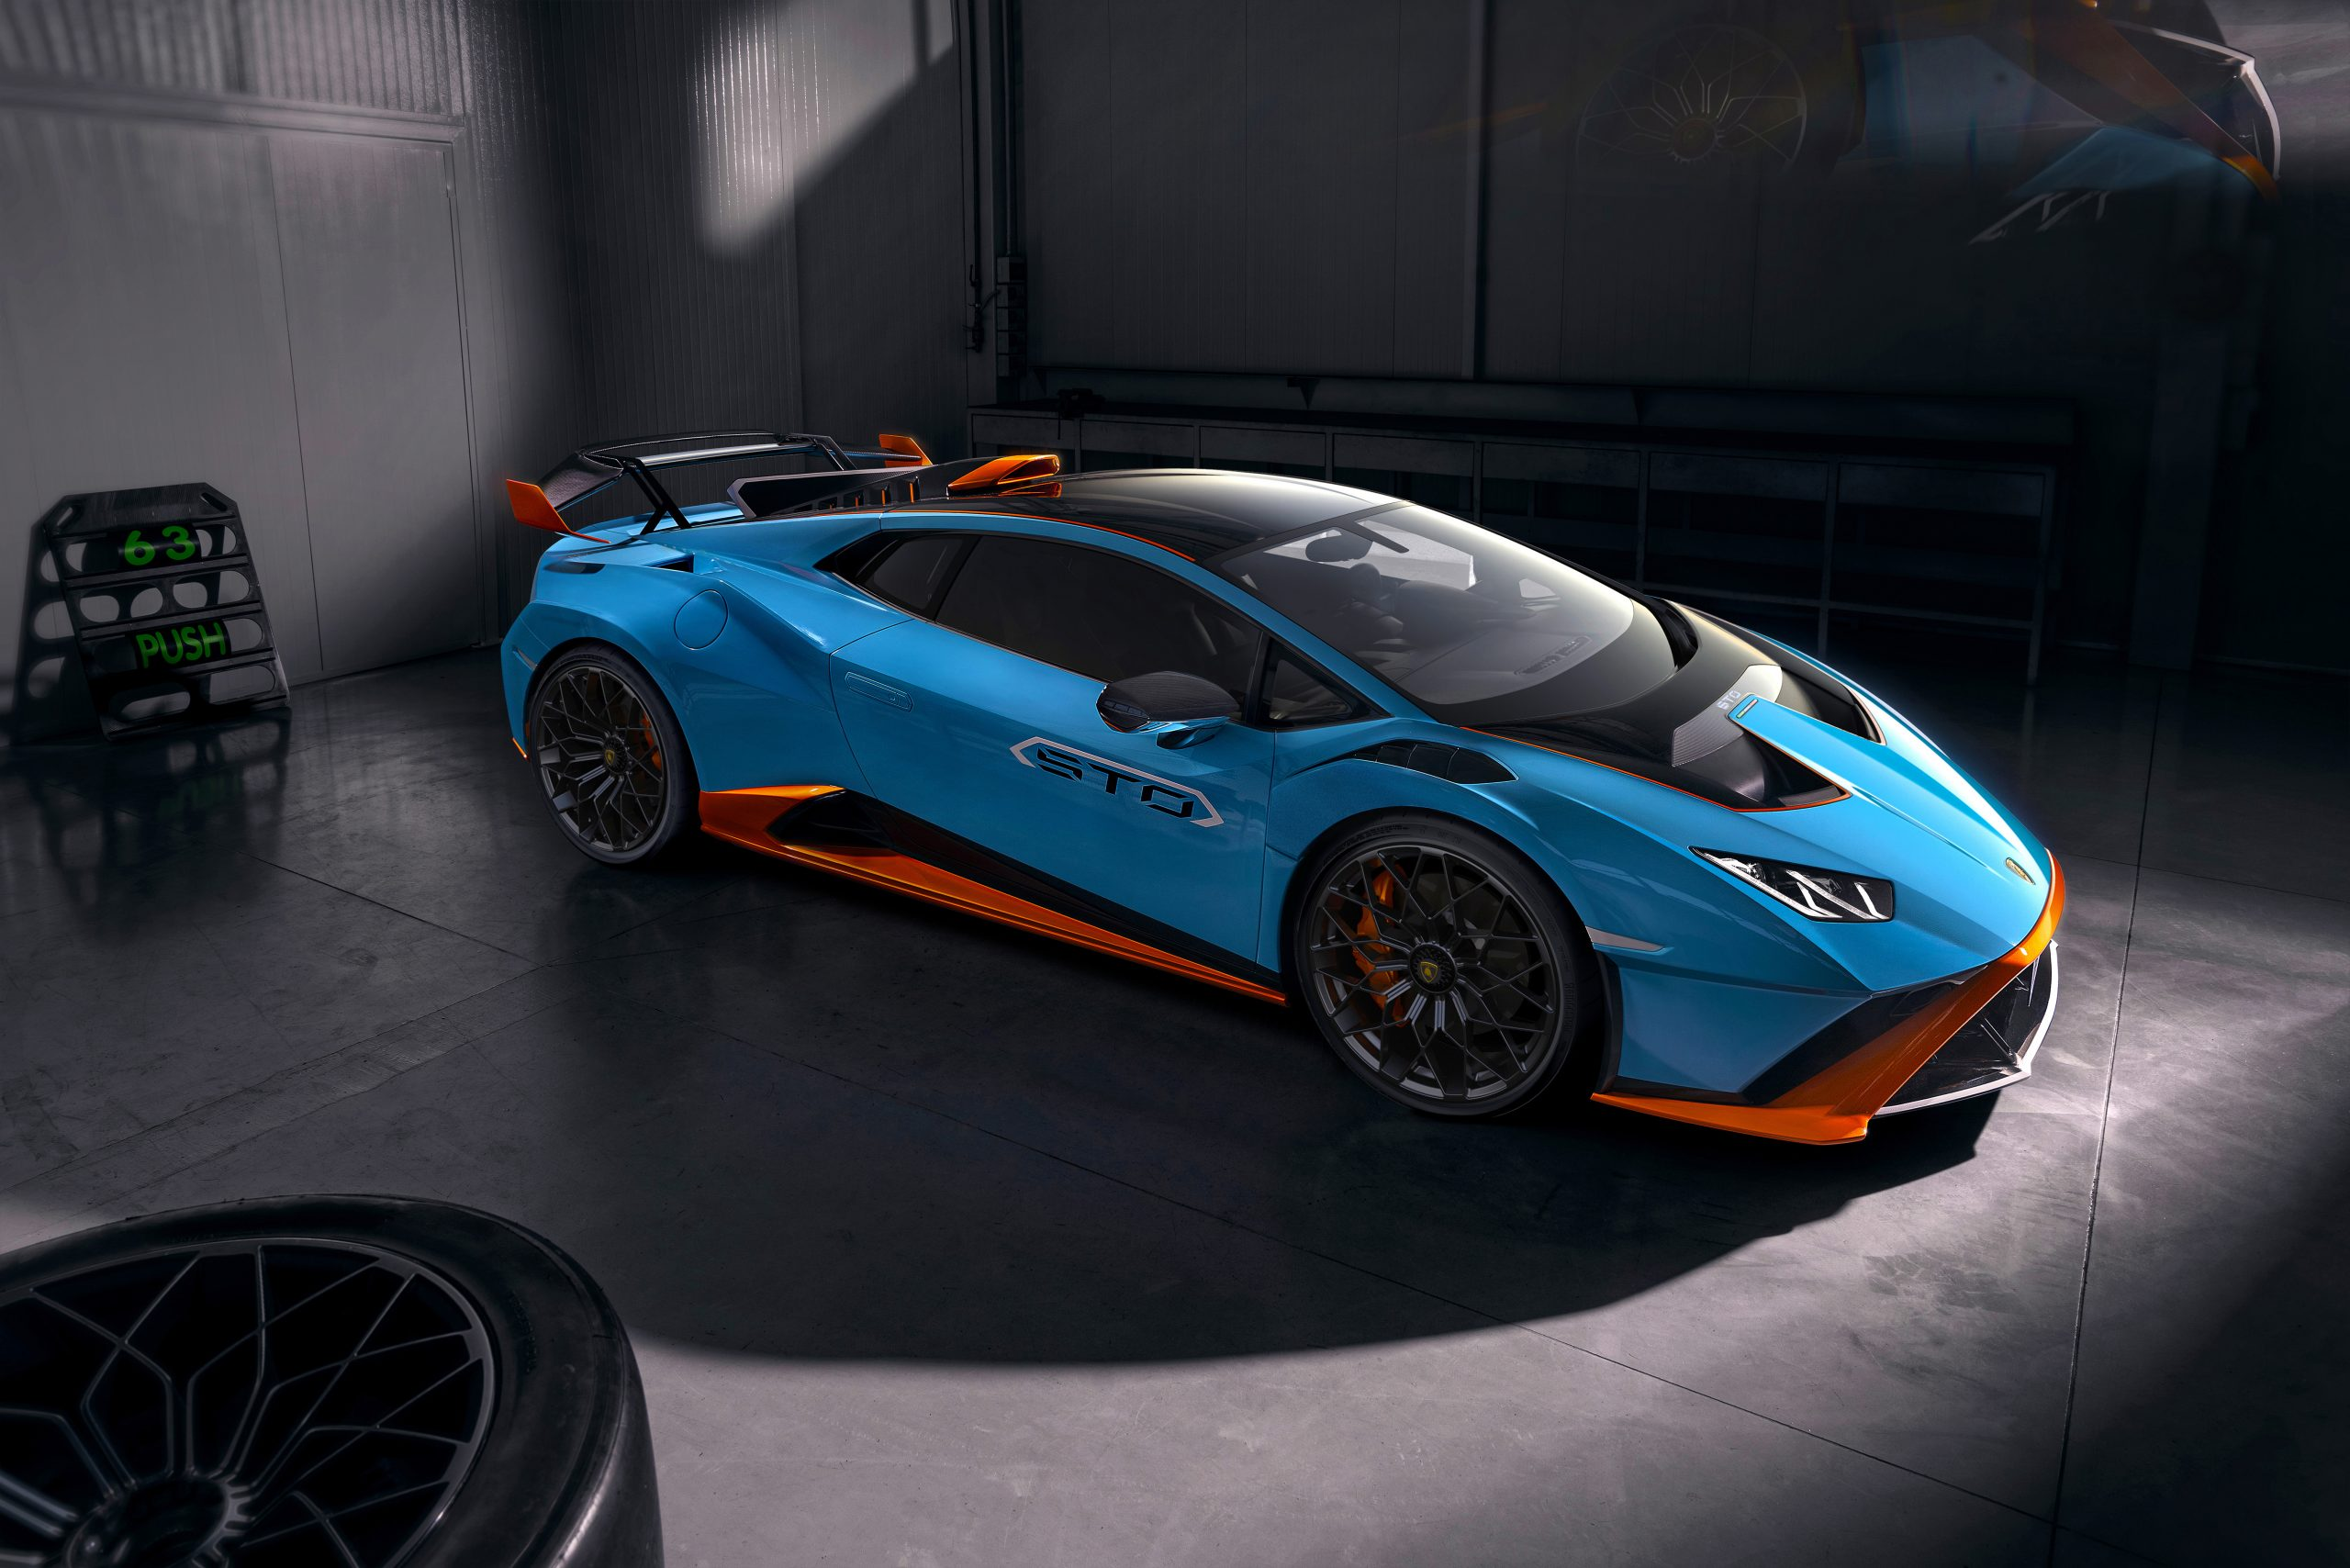 Lamborghini Huracan STO side garage 2